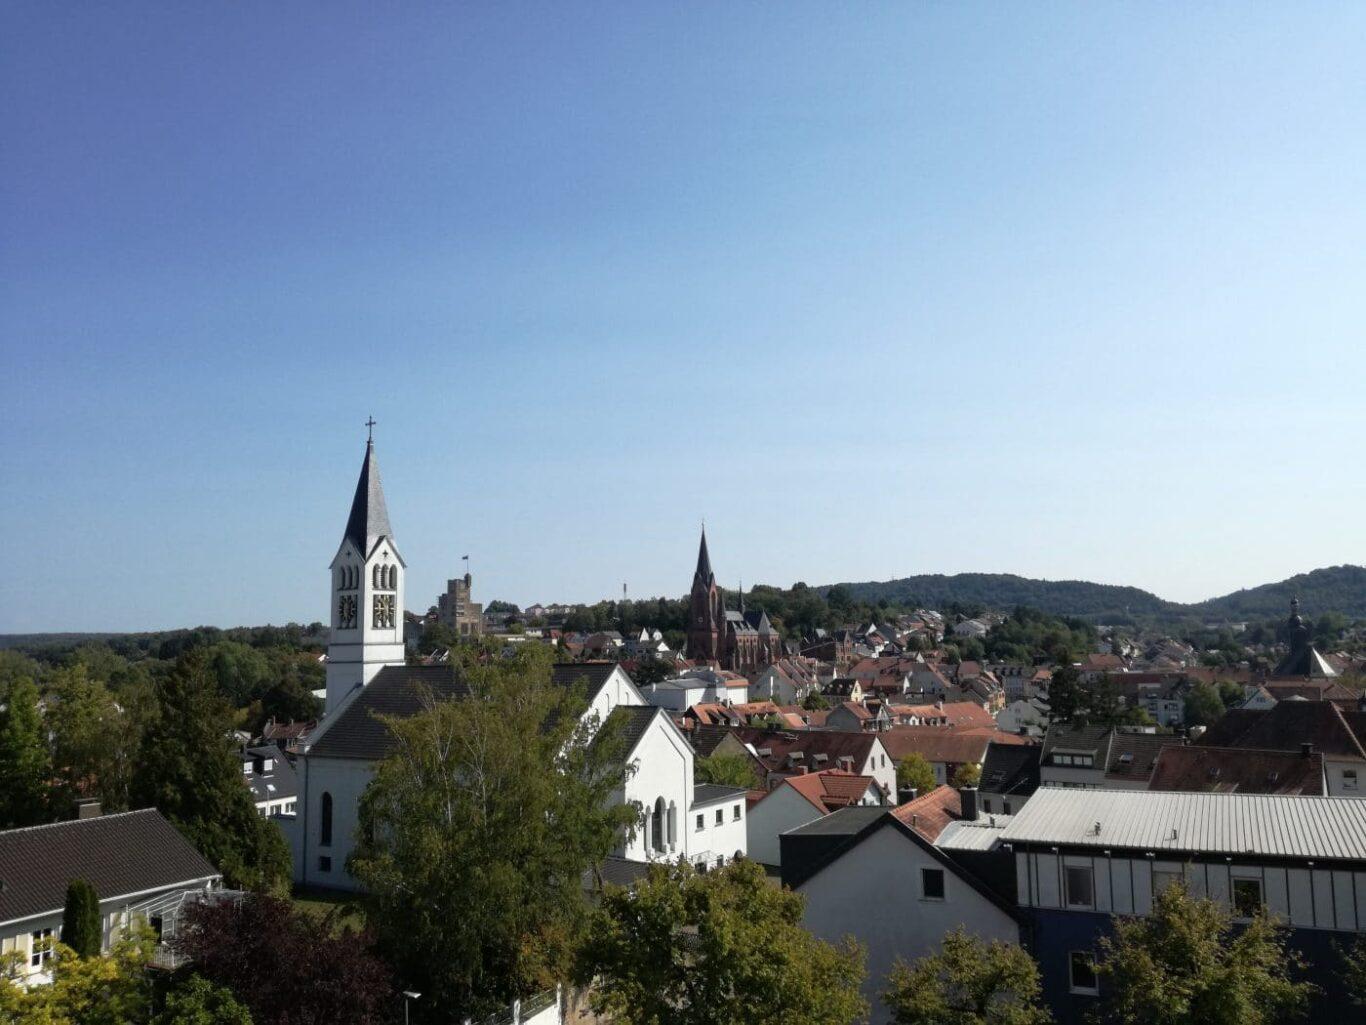 Blick auf St. Ingbert | Bild: M. Müller-Lang